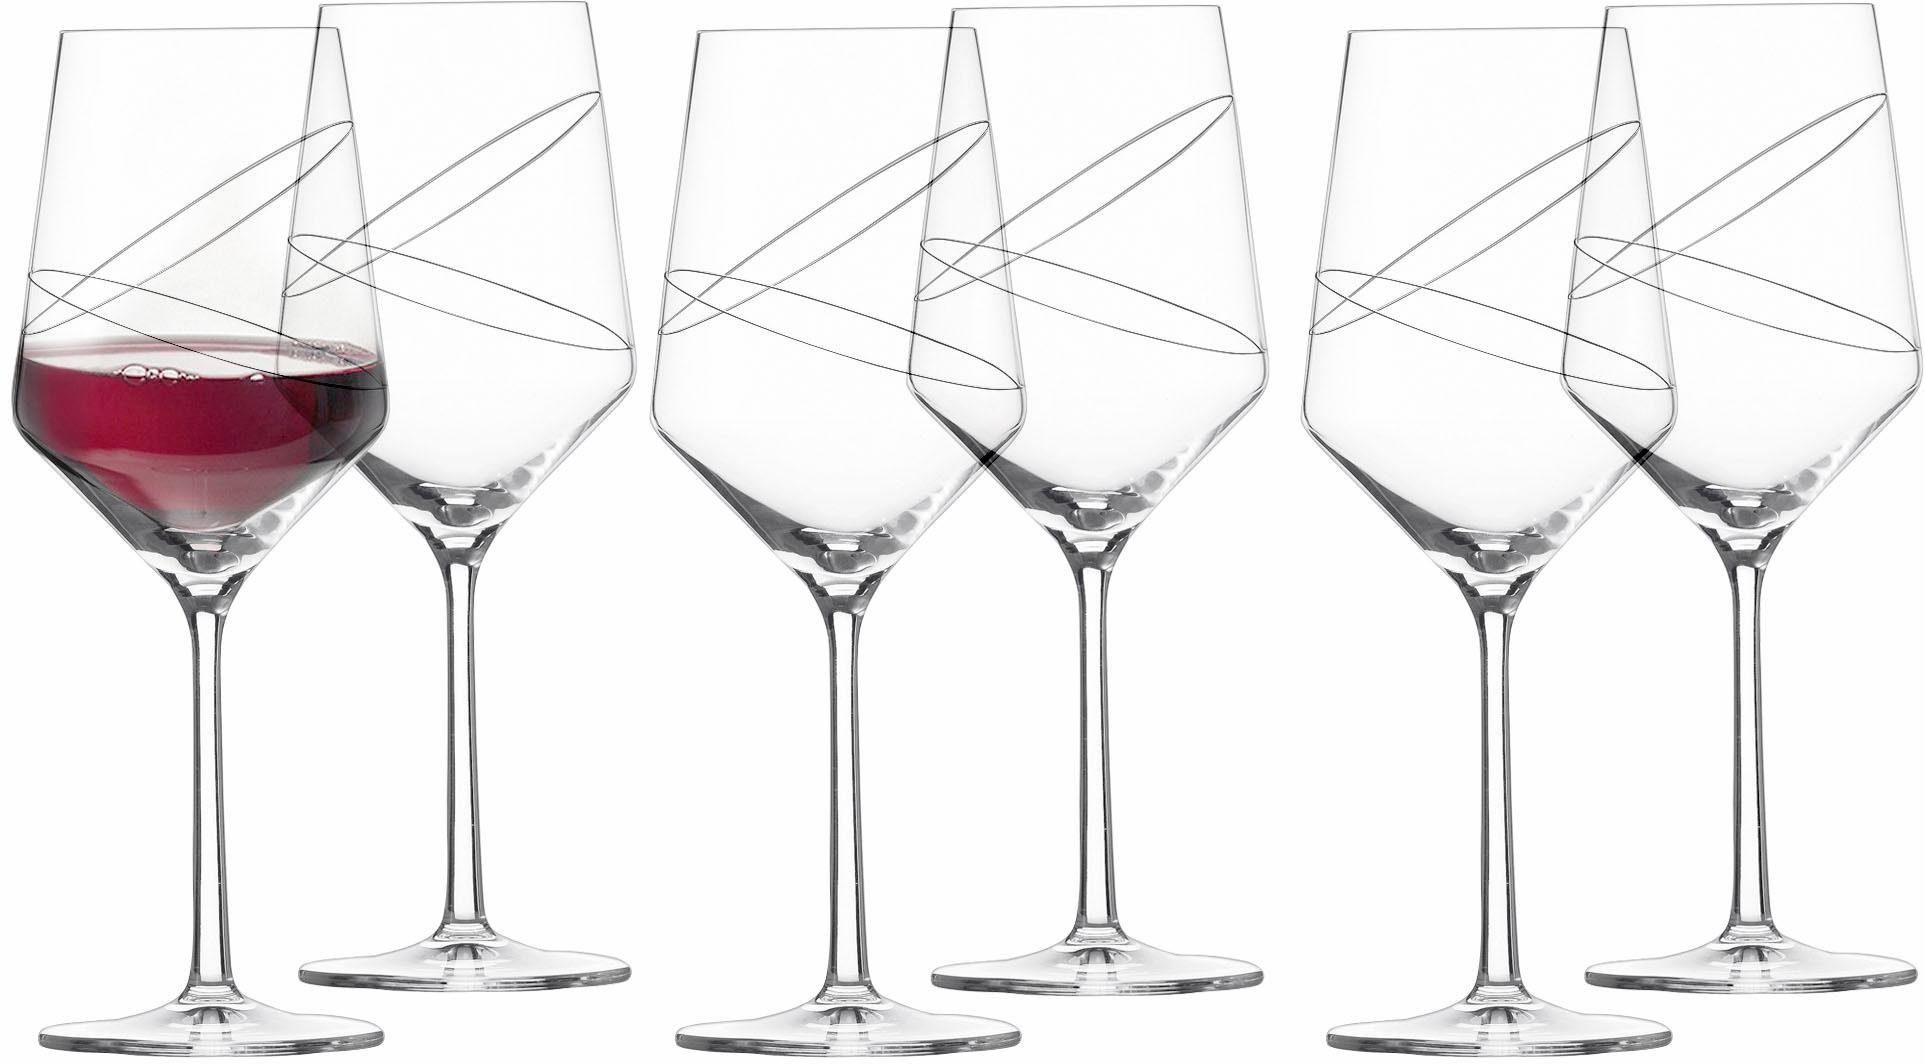 Alexander Herrmann Rotweingläser, Kristallglas, 6 Stück, 540 ml, Made in Germany, »GOURMET Linie«